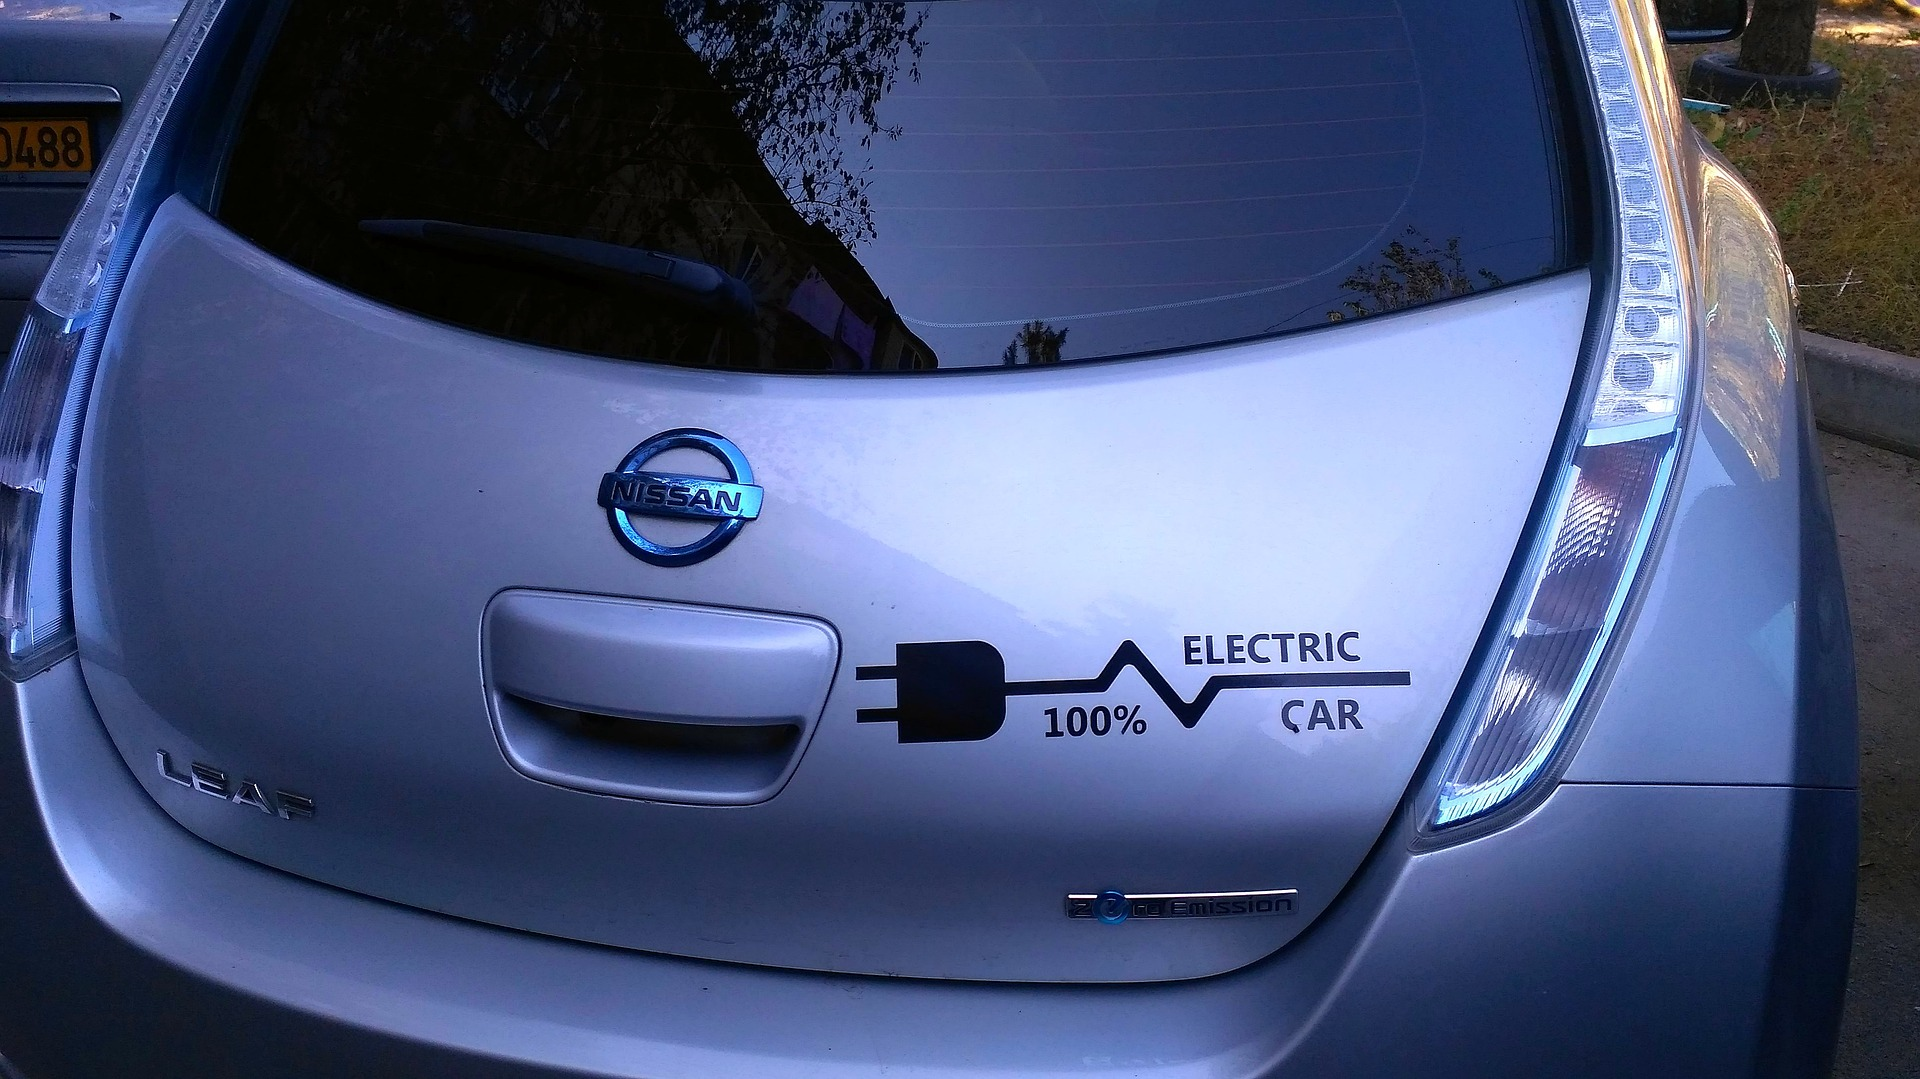 Na Podilli bilja «prozoryh ofisiv» vstanovljať stanciї dlja elektromobiliv